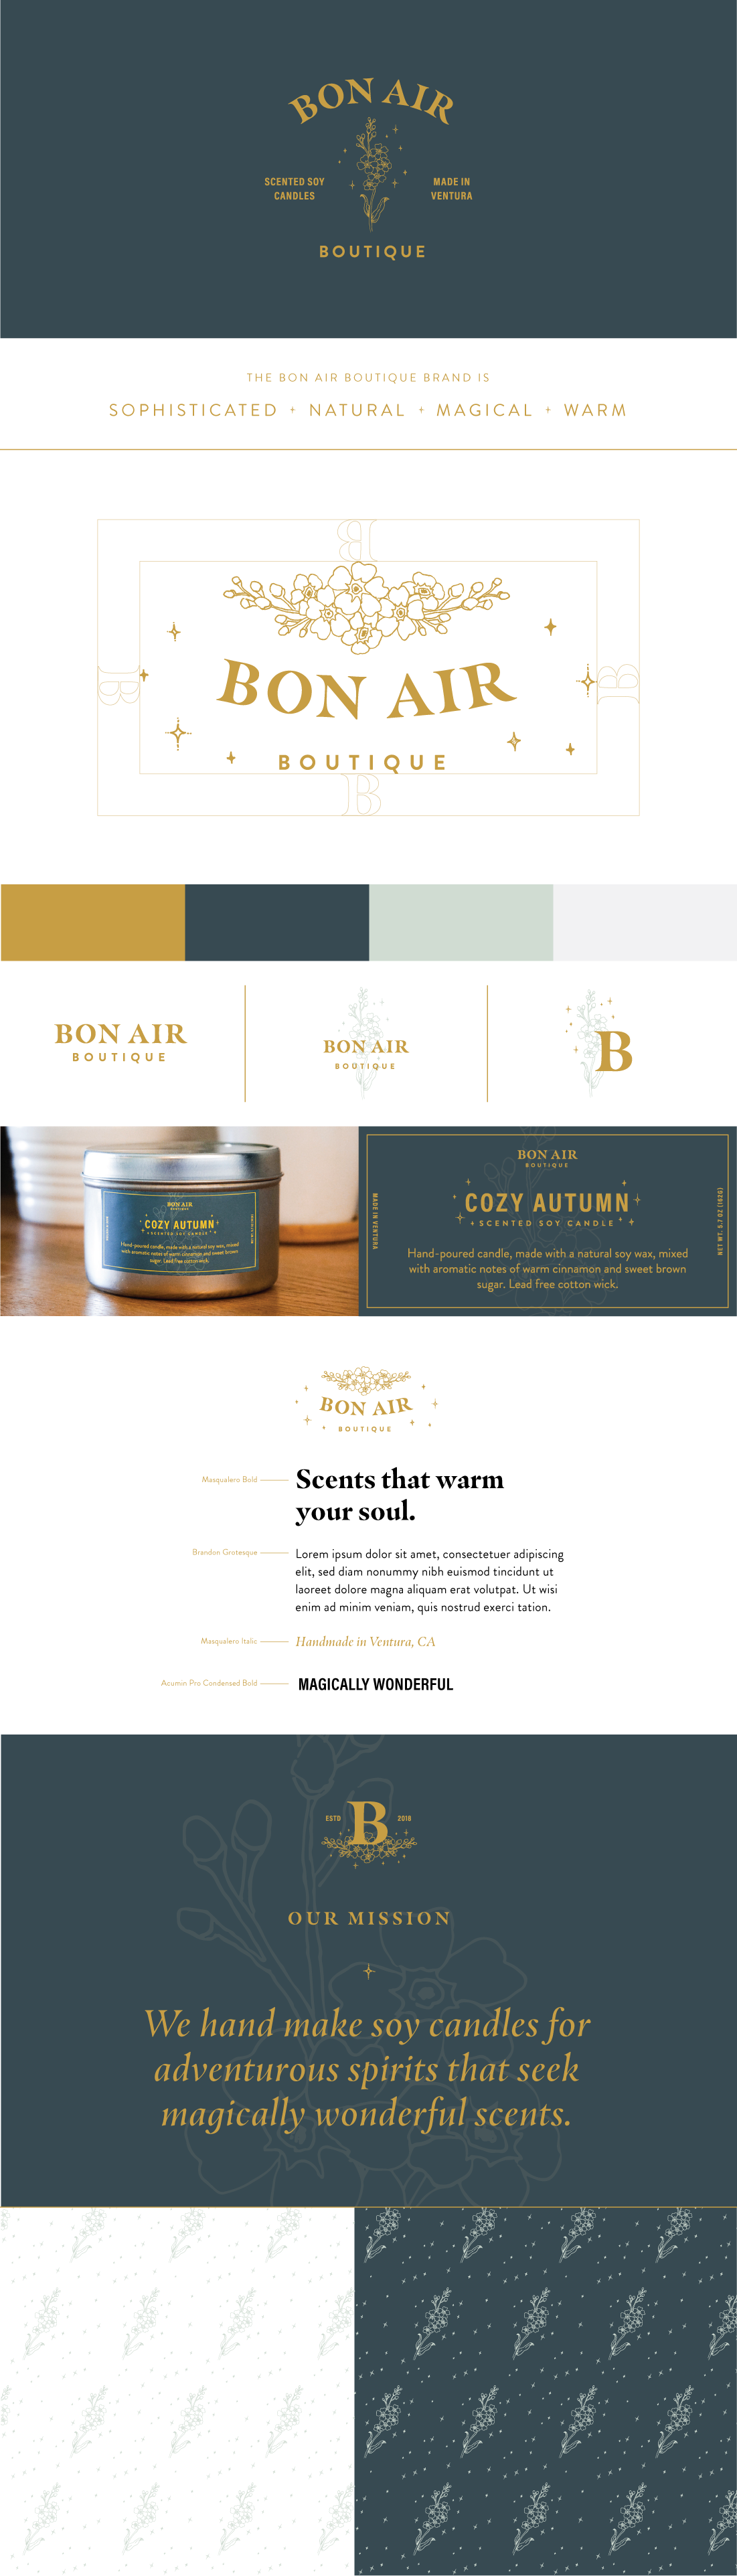 Bon Air Soy Wax Handmade Candles Brand Identity Wander Design Co